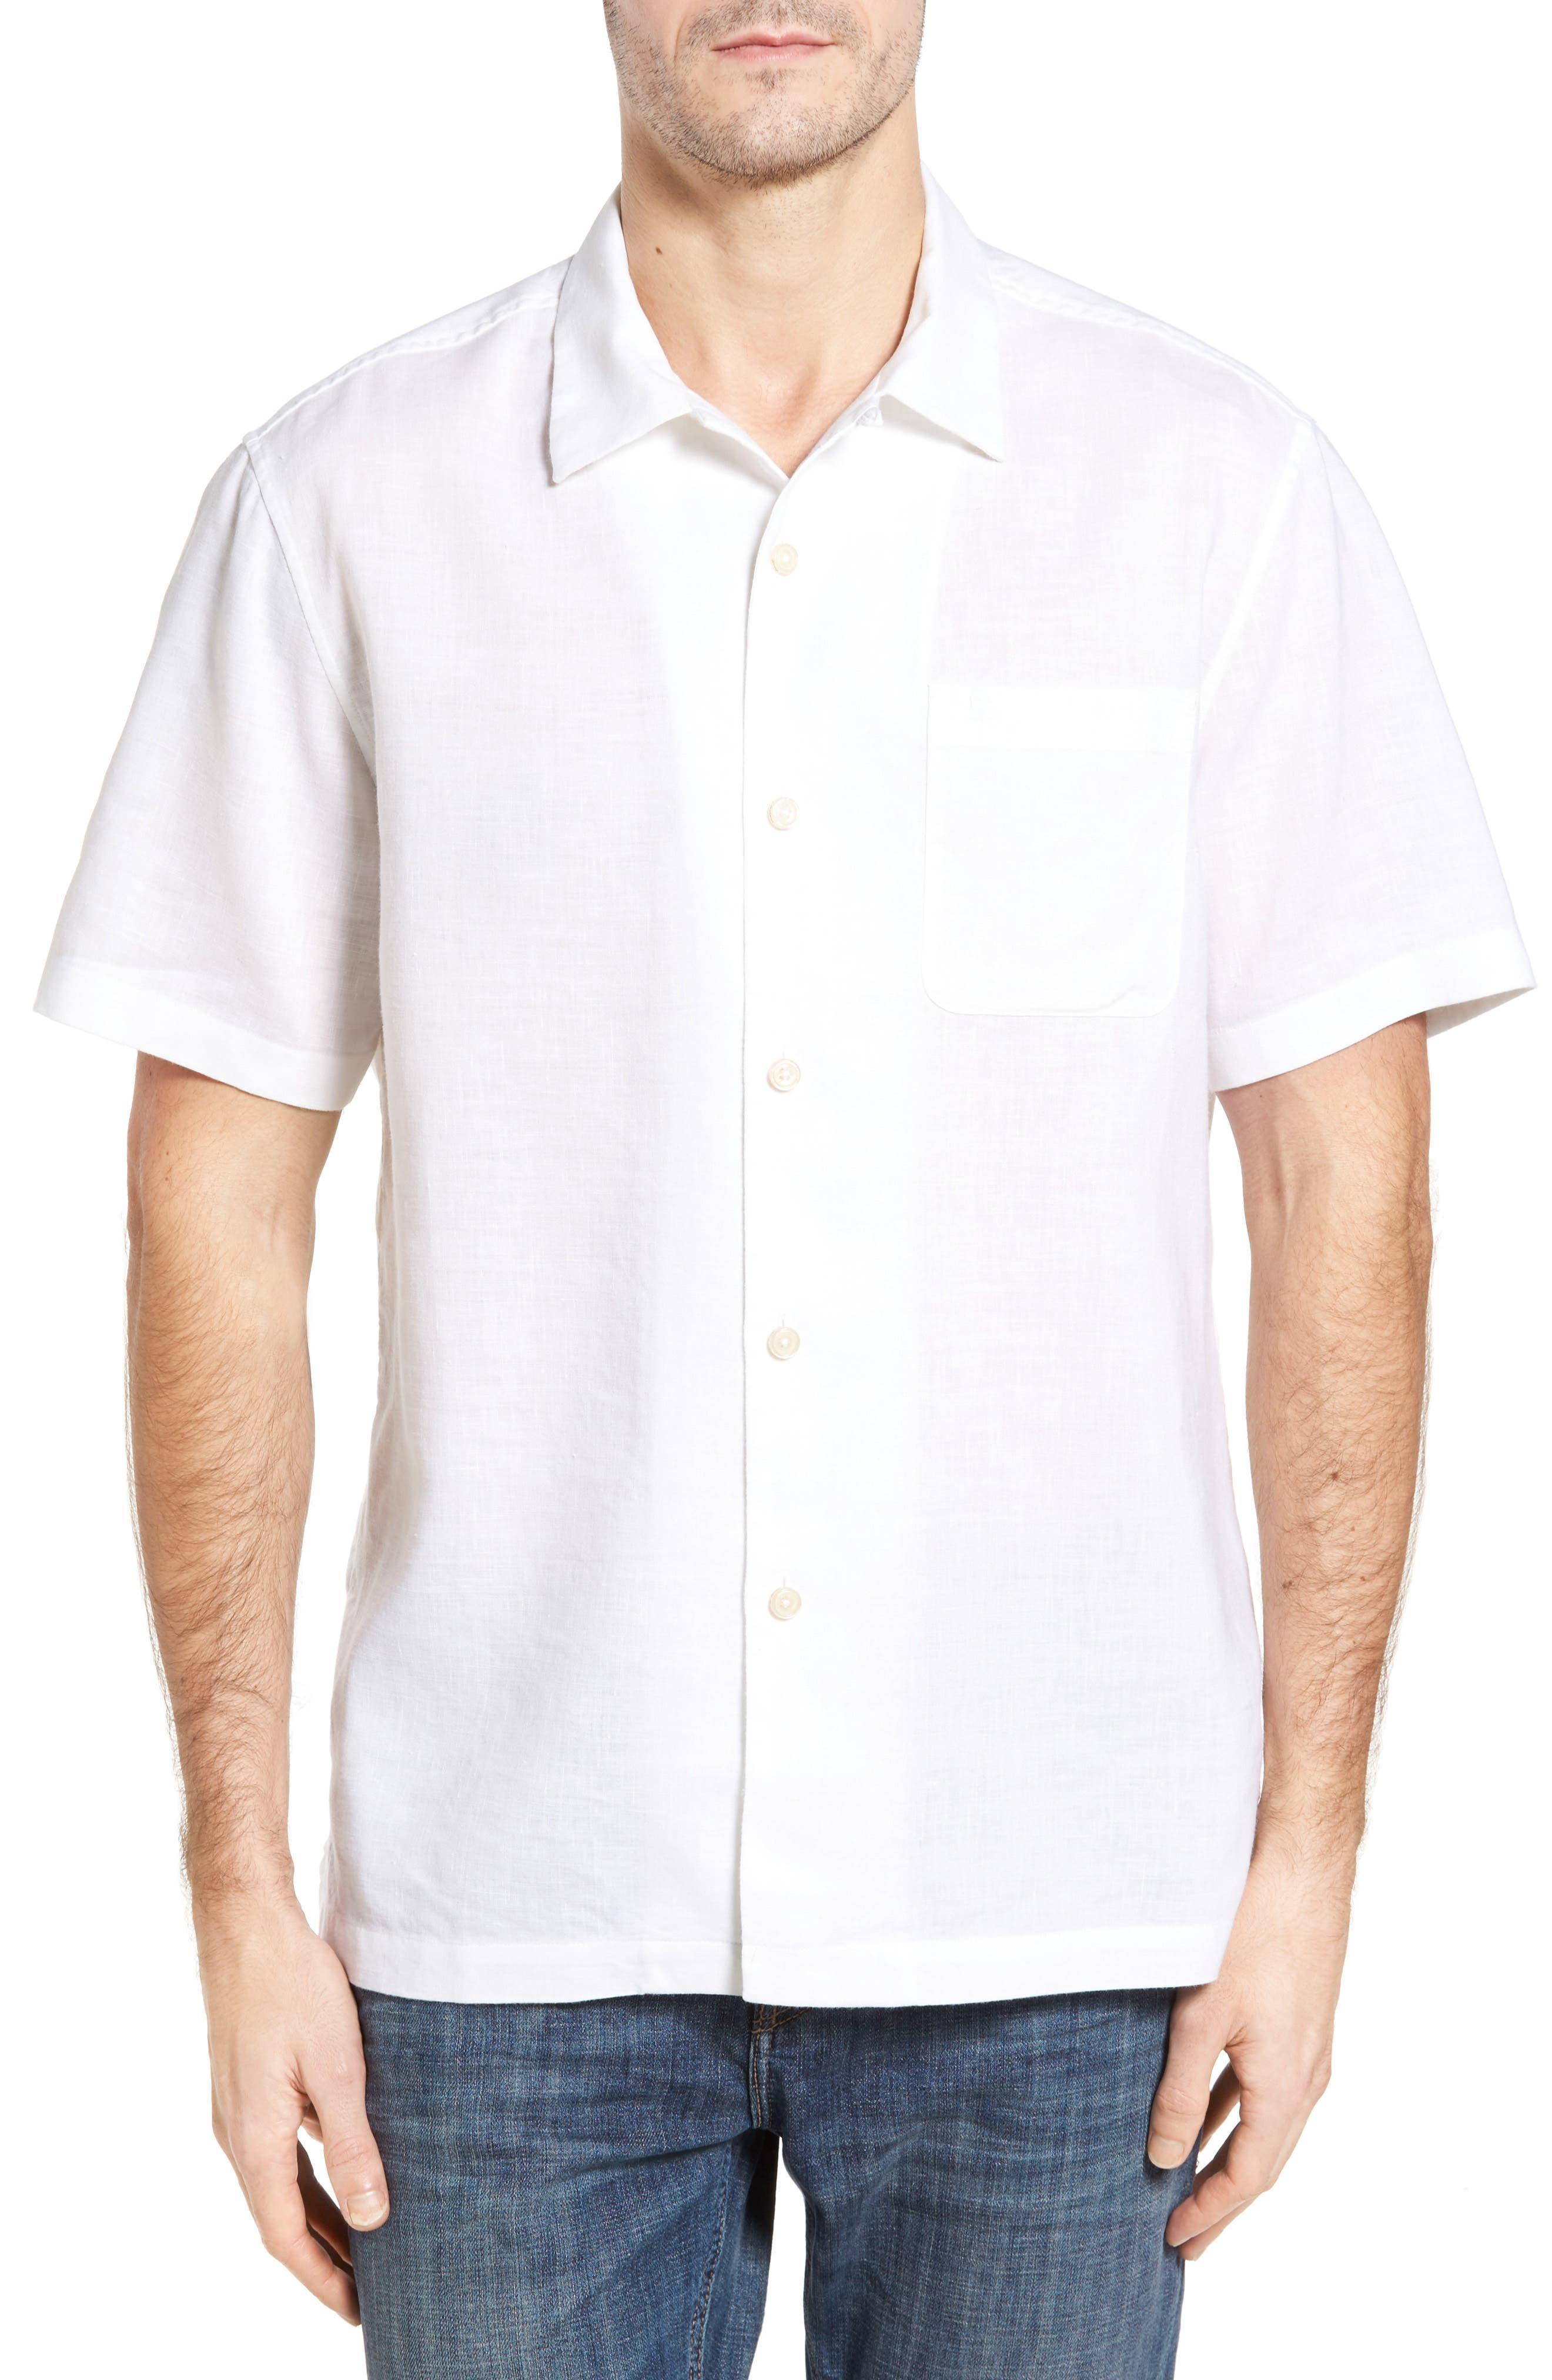 Main Image - Tommy Bahama Monaco Tides Linen Blend Camp Shirt